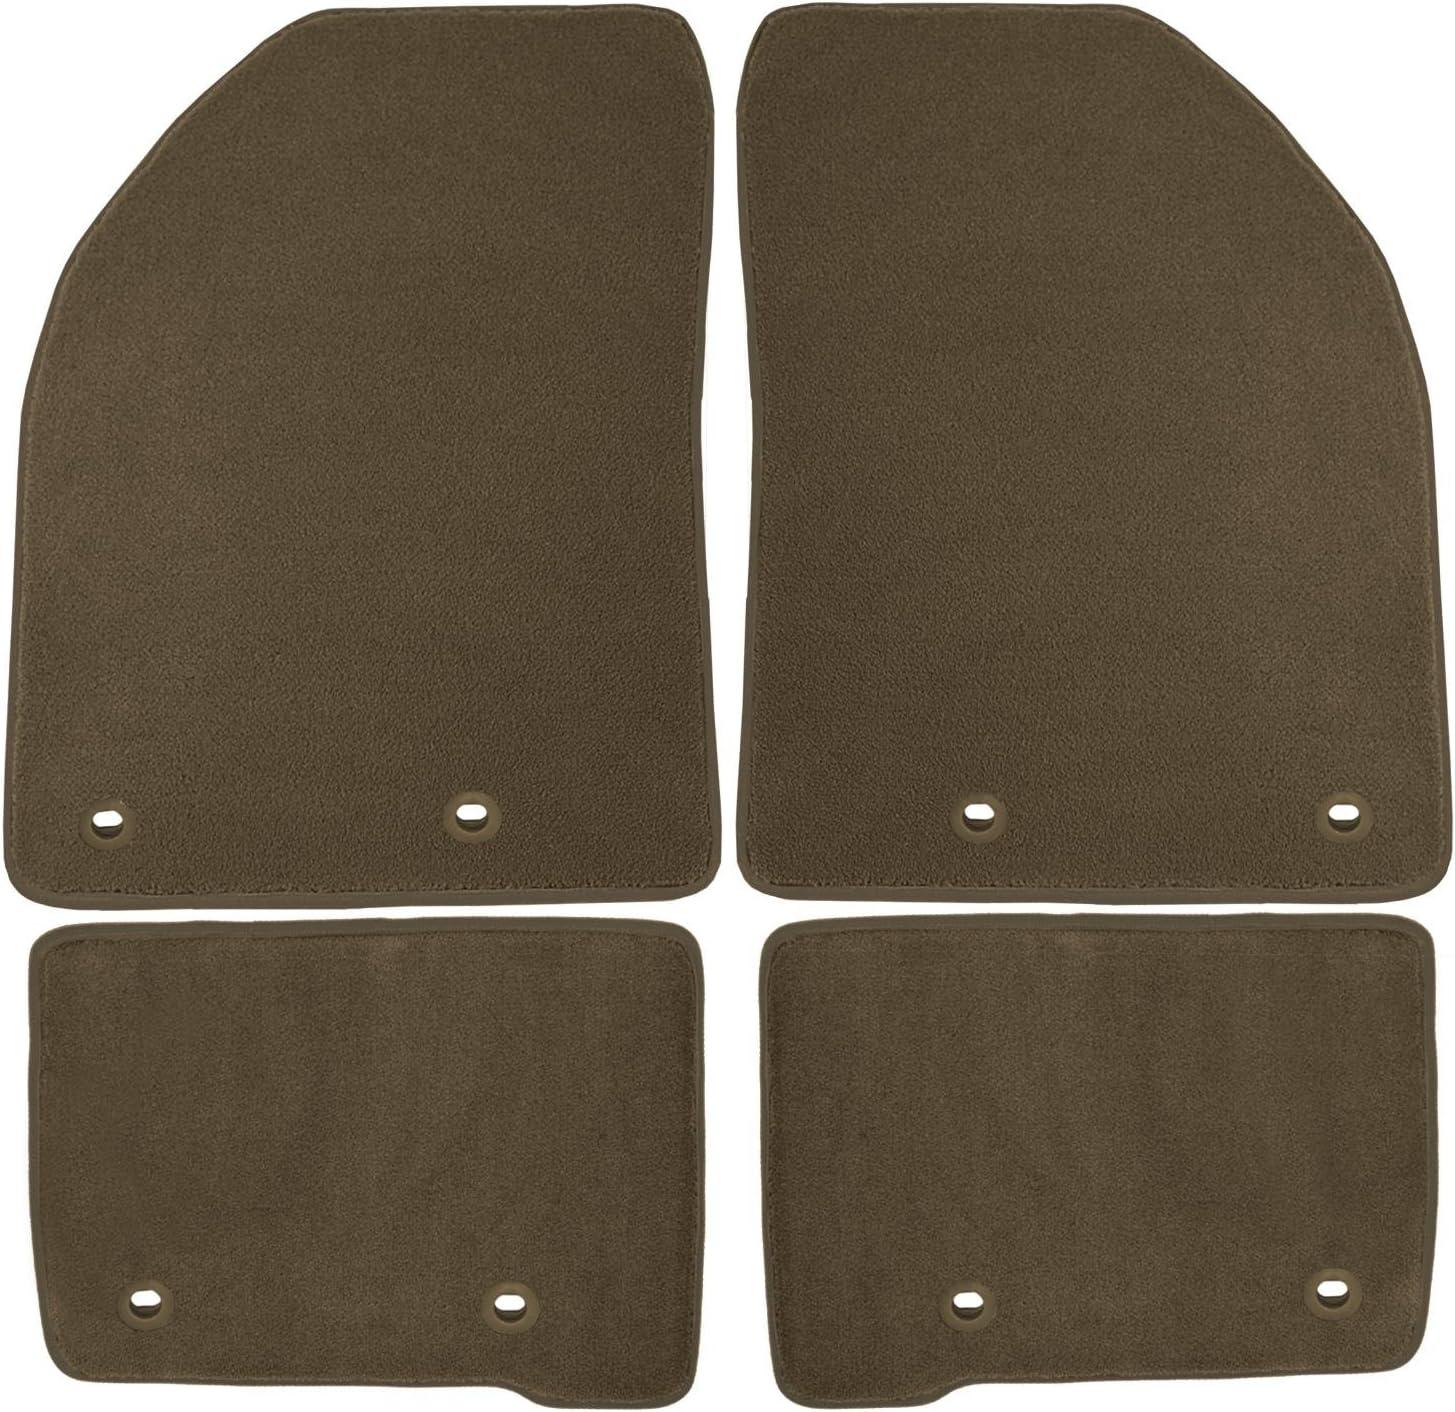 Coverking Front Custom Fit Floor Mats for Select Toyota Matsrix Models 70 Oz Carpet Oak